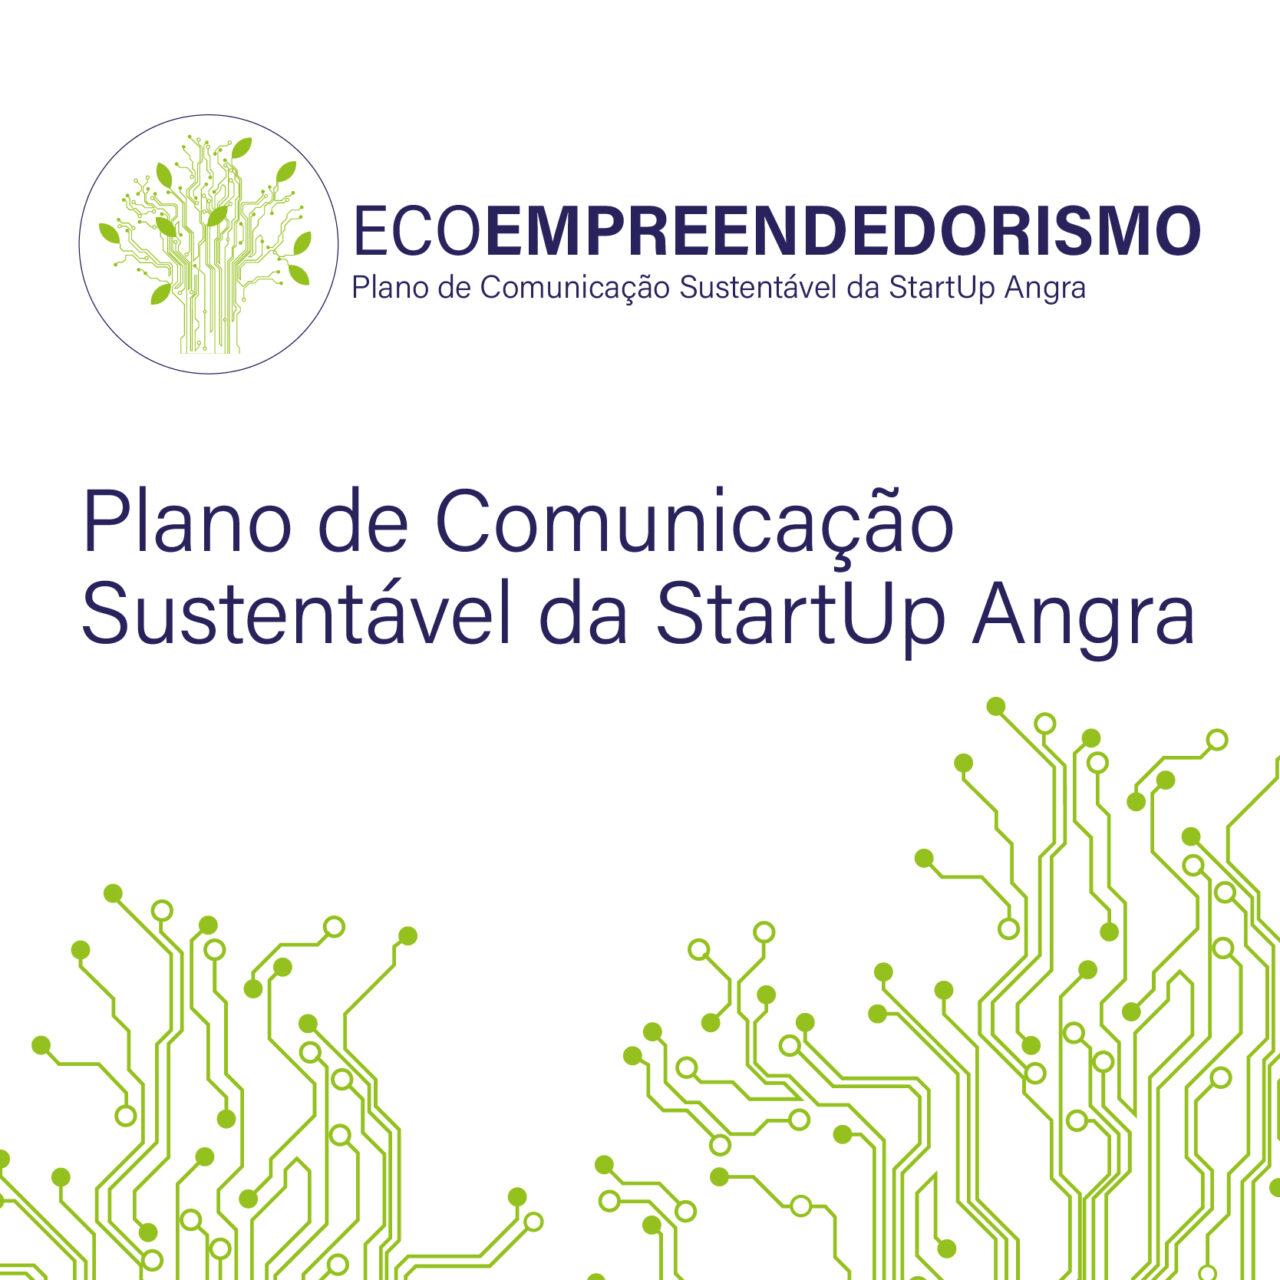 http://www.startupangra.com/wp-content/uploads/2021/02/eco_post-1280x1280.jpg